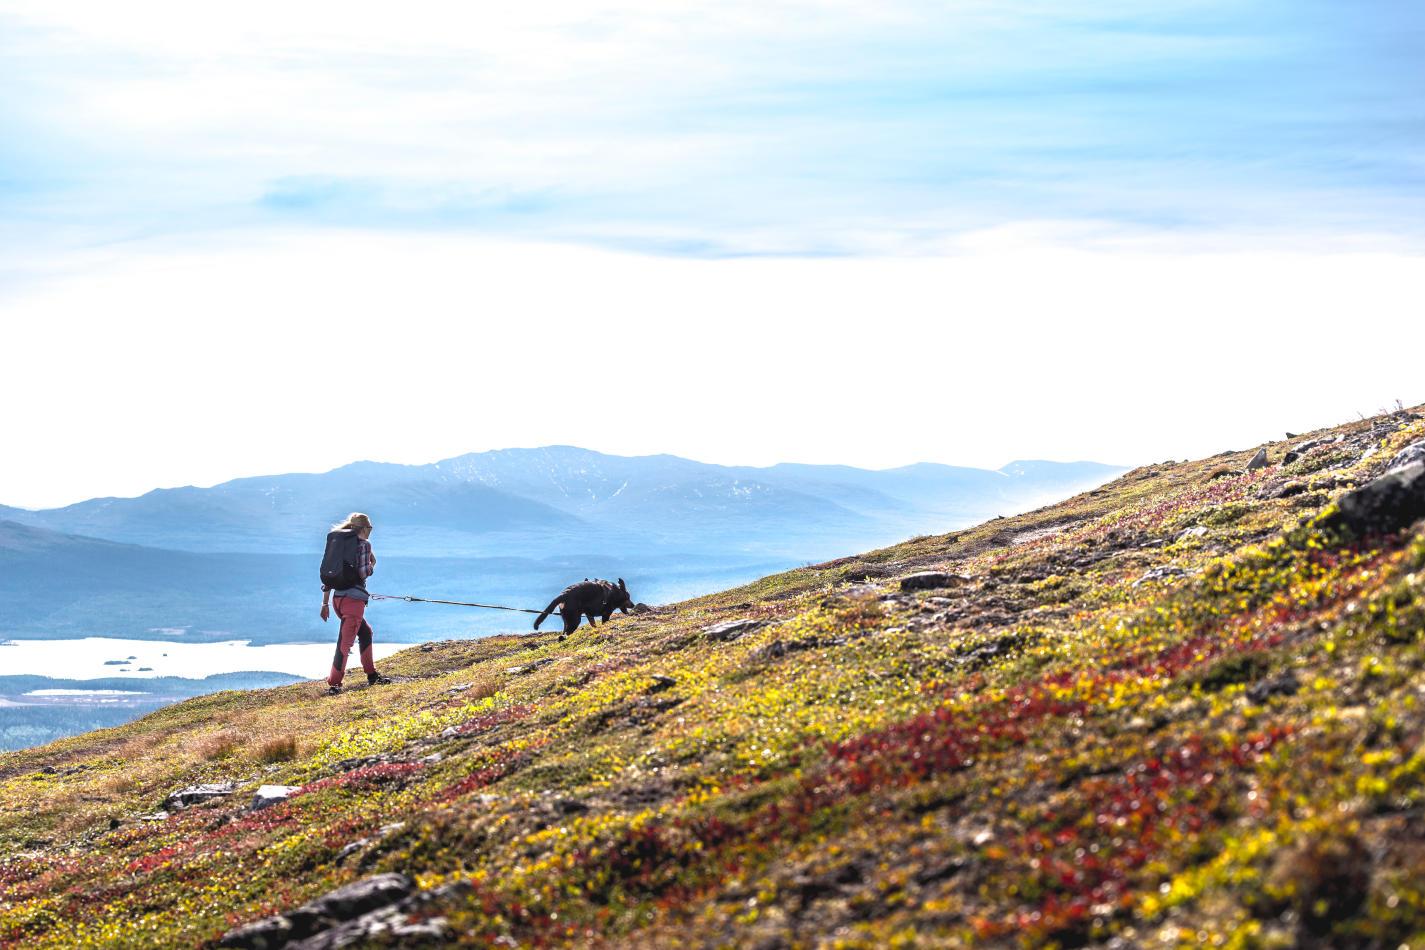 Trillevallen | A classic winter oasis | Scan Magazine